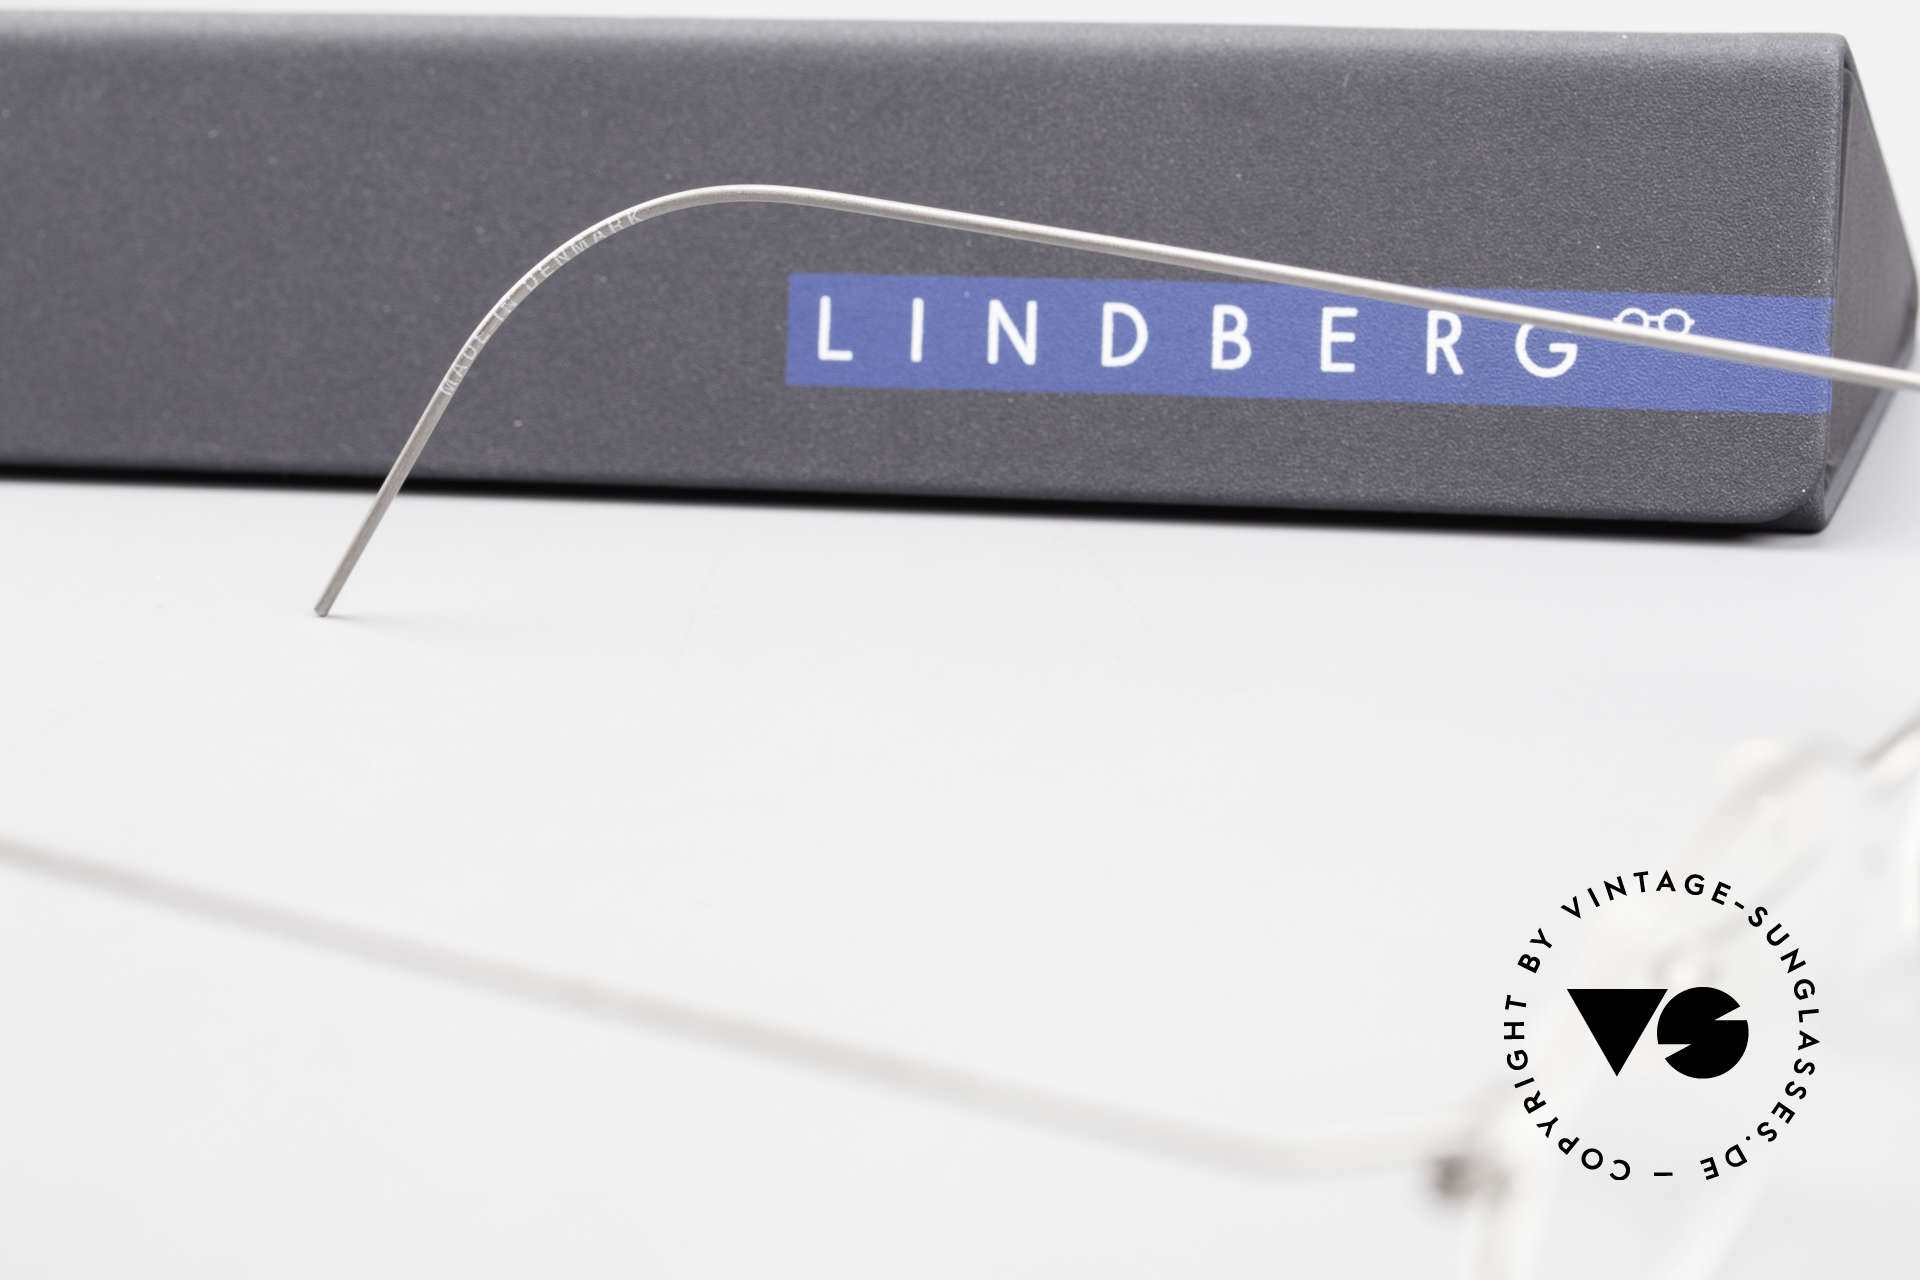 Lindberg Zeta Air Titan Rim Titanium Frame Small Unisex, Size: small, Made for Men and Women